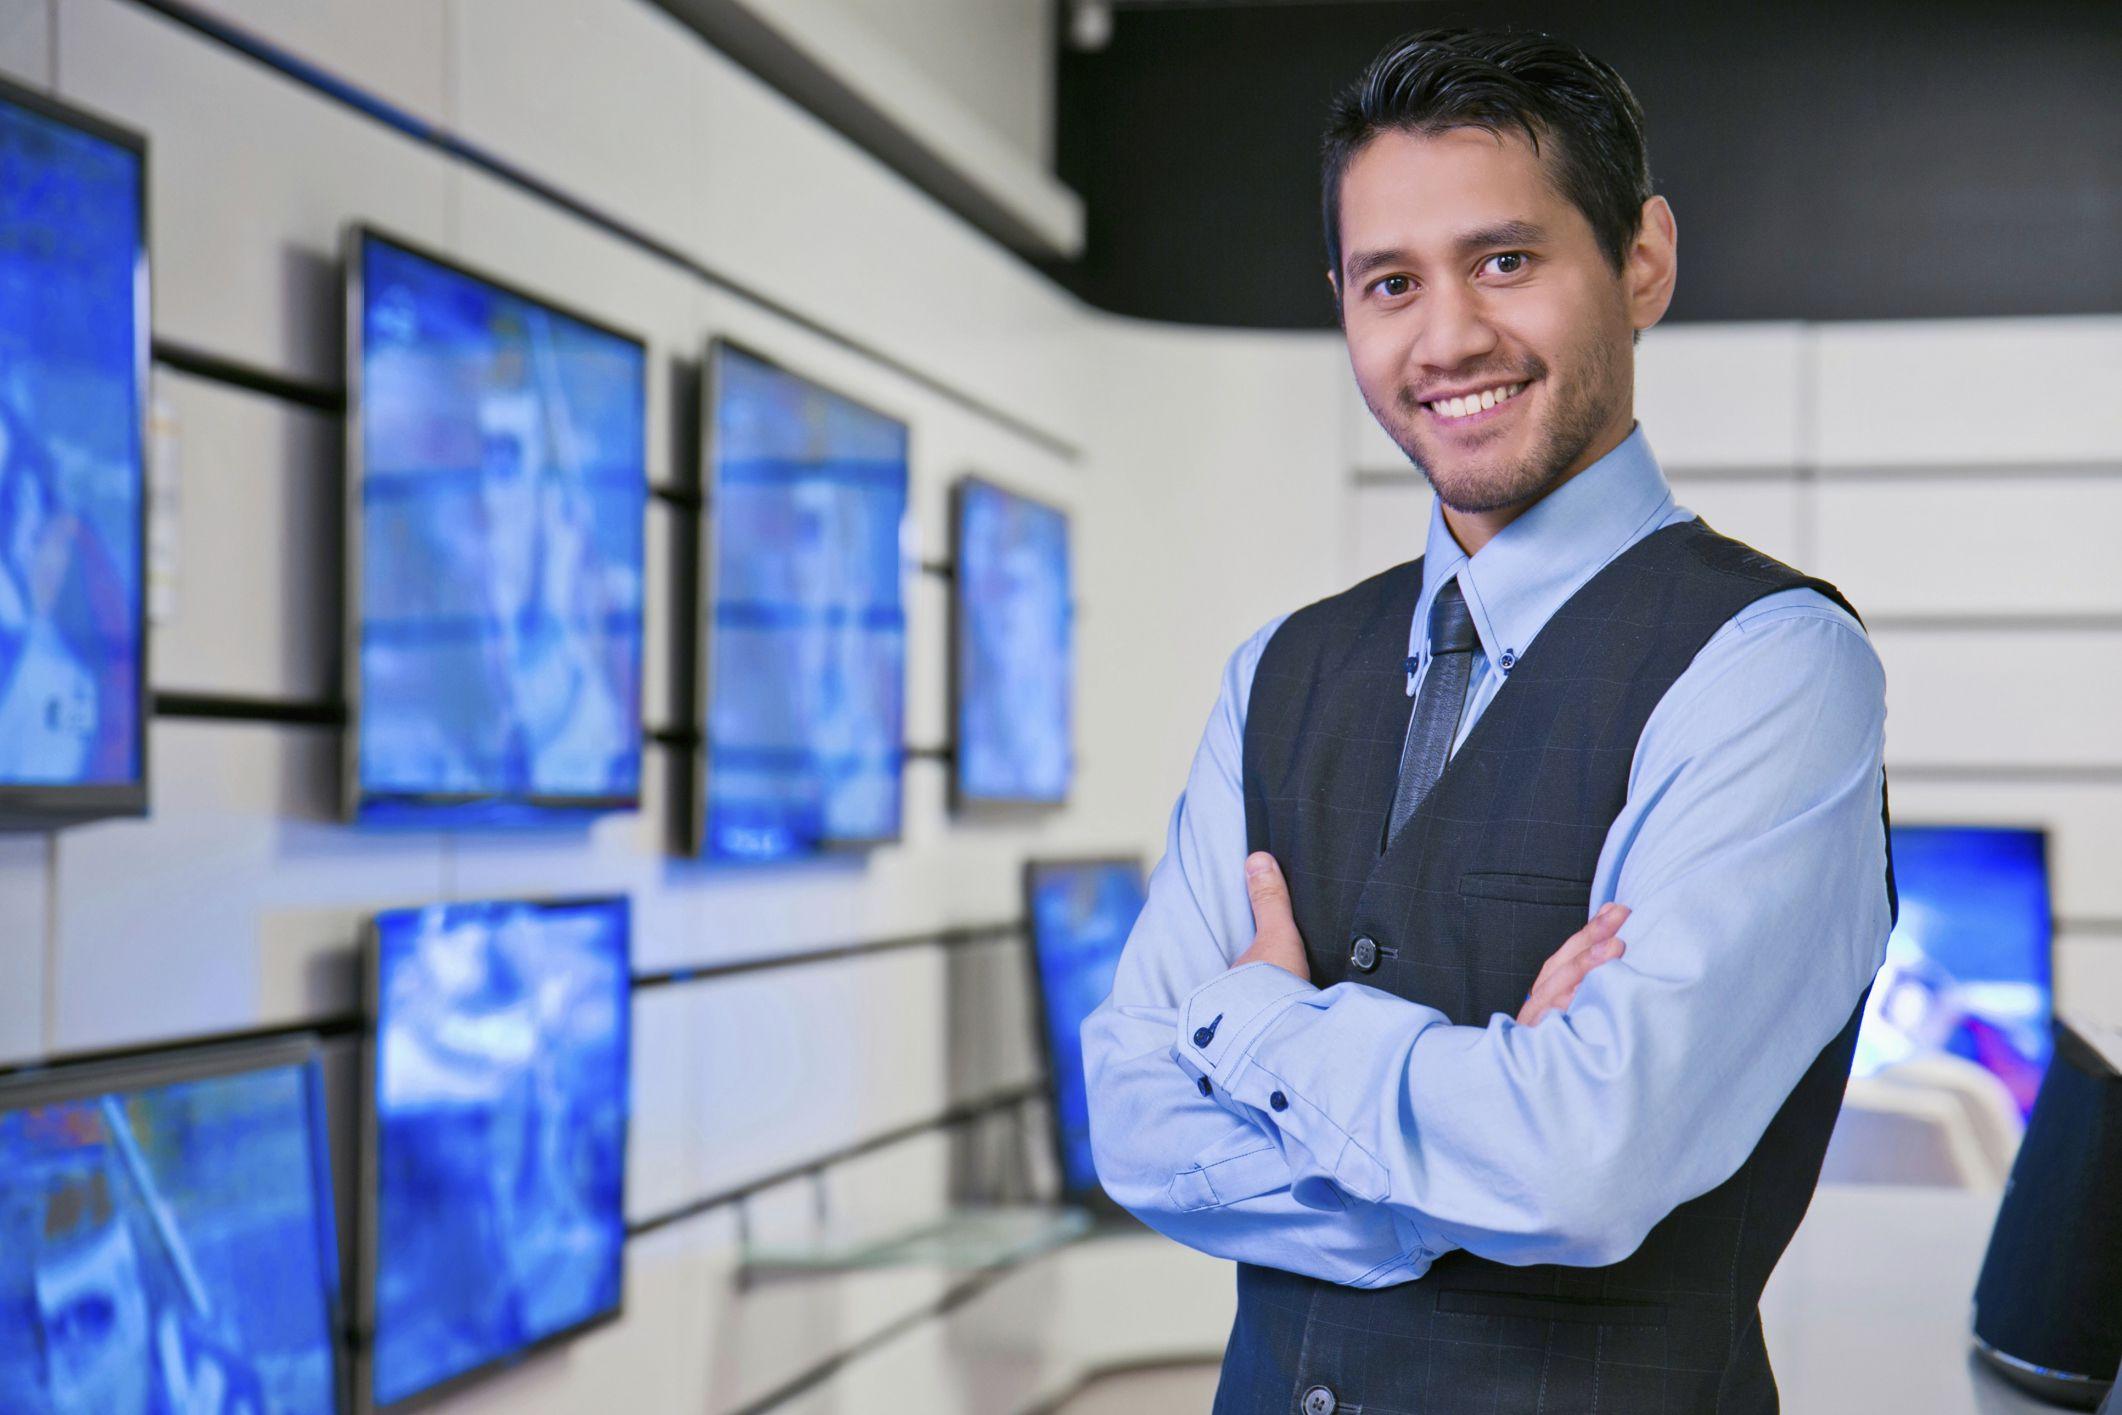 Busqueda de empleo: Ejemplo de currículum para un vendedor